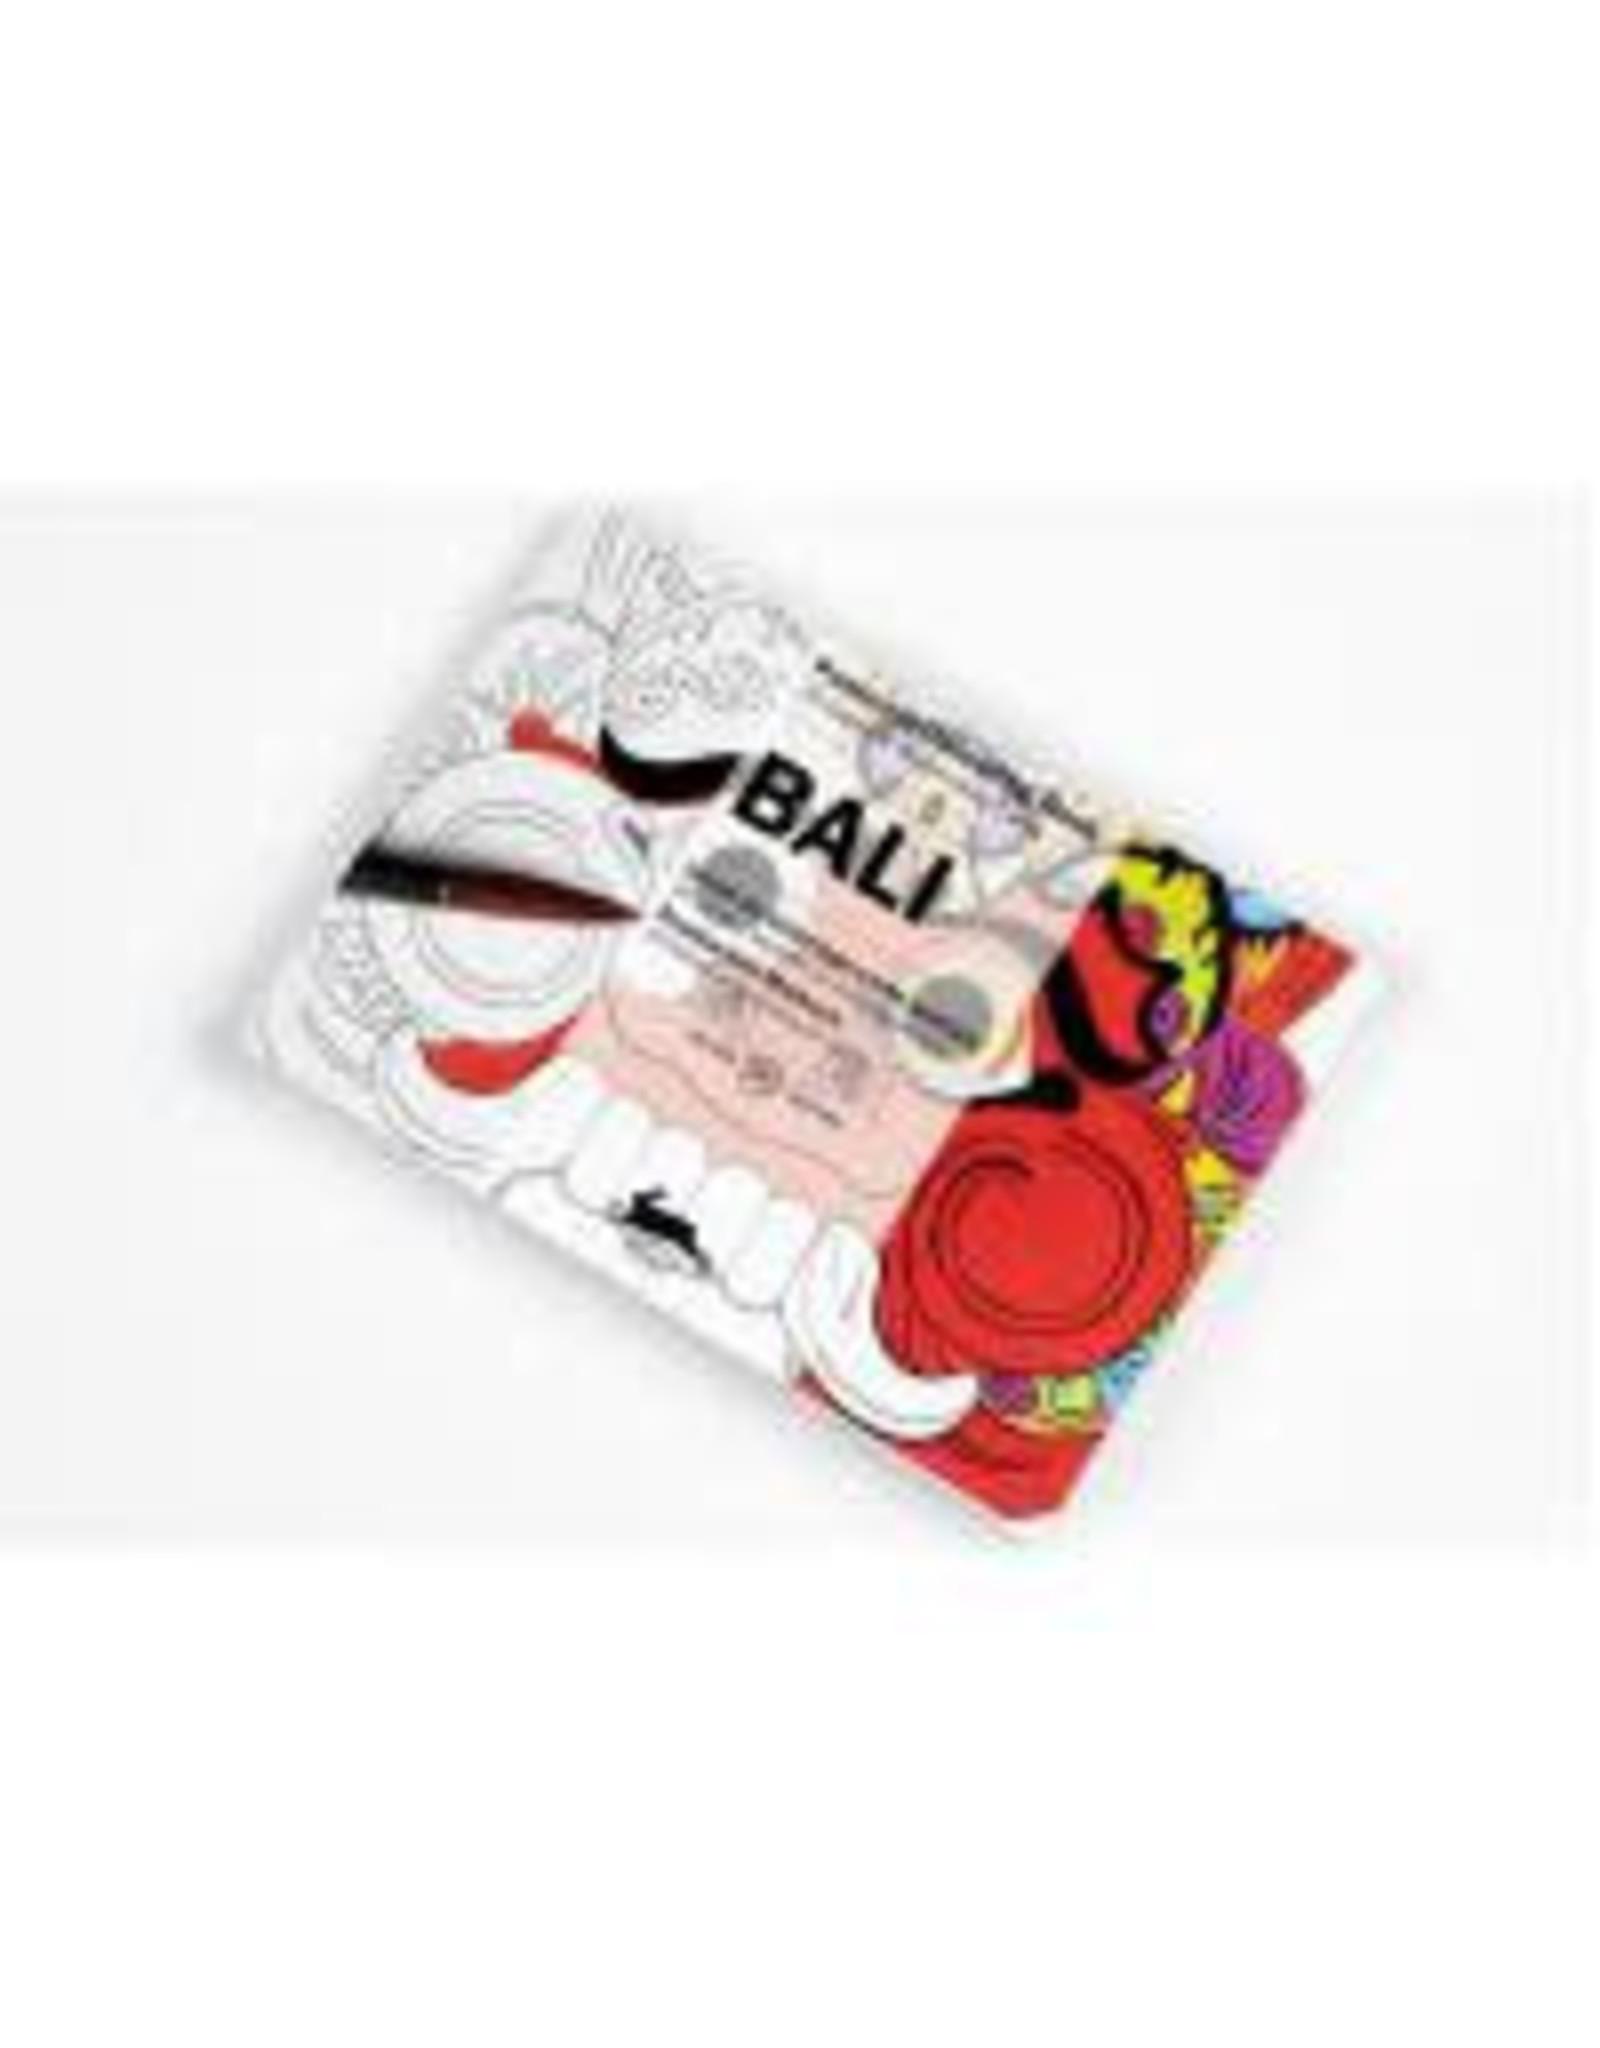 Postcard colouring book - Bali